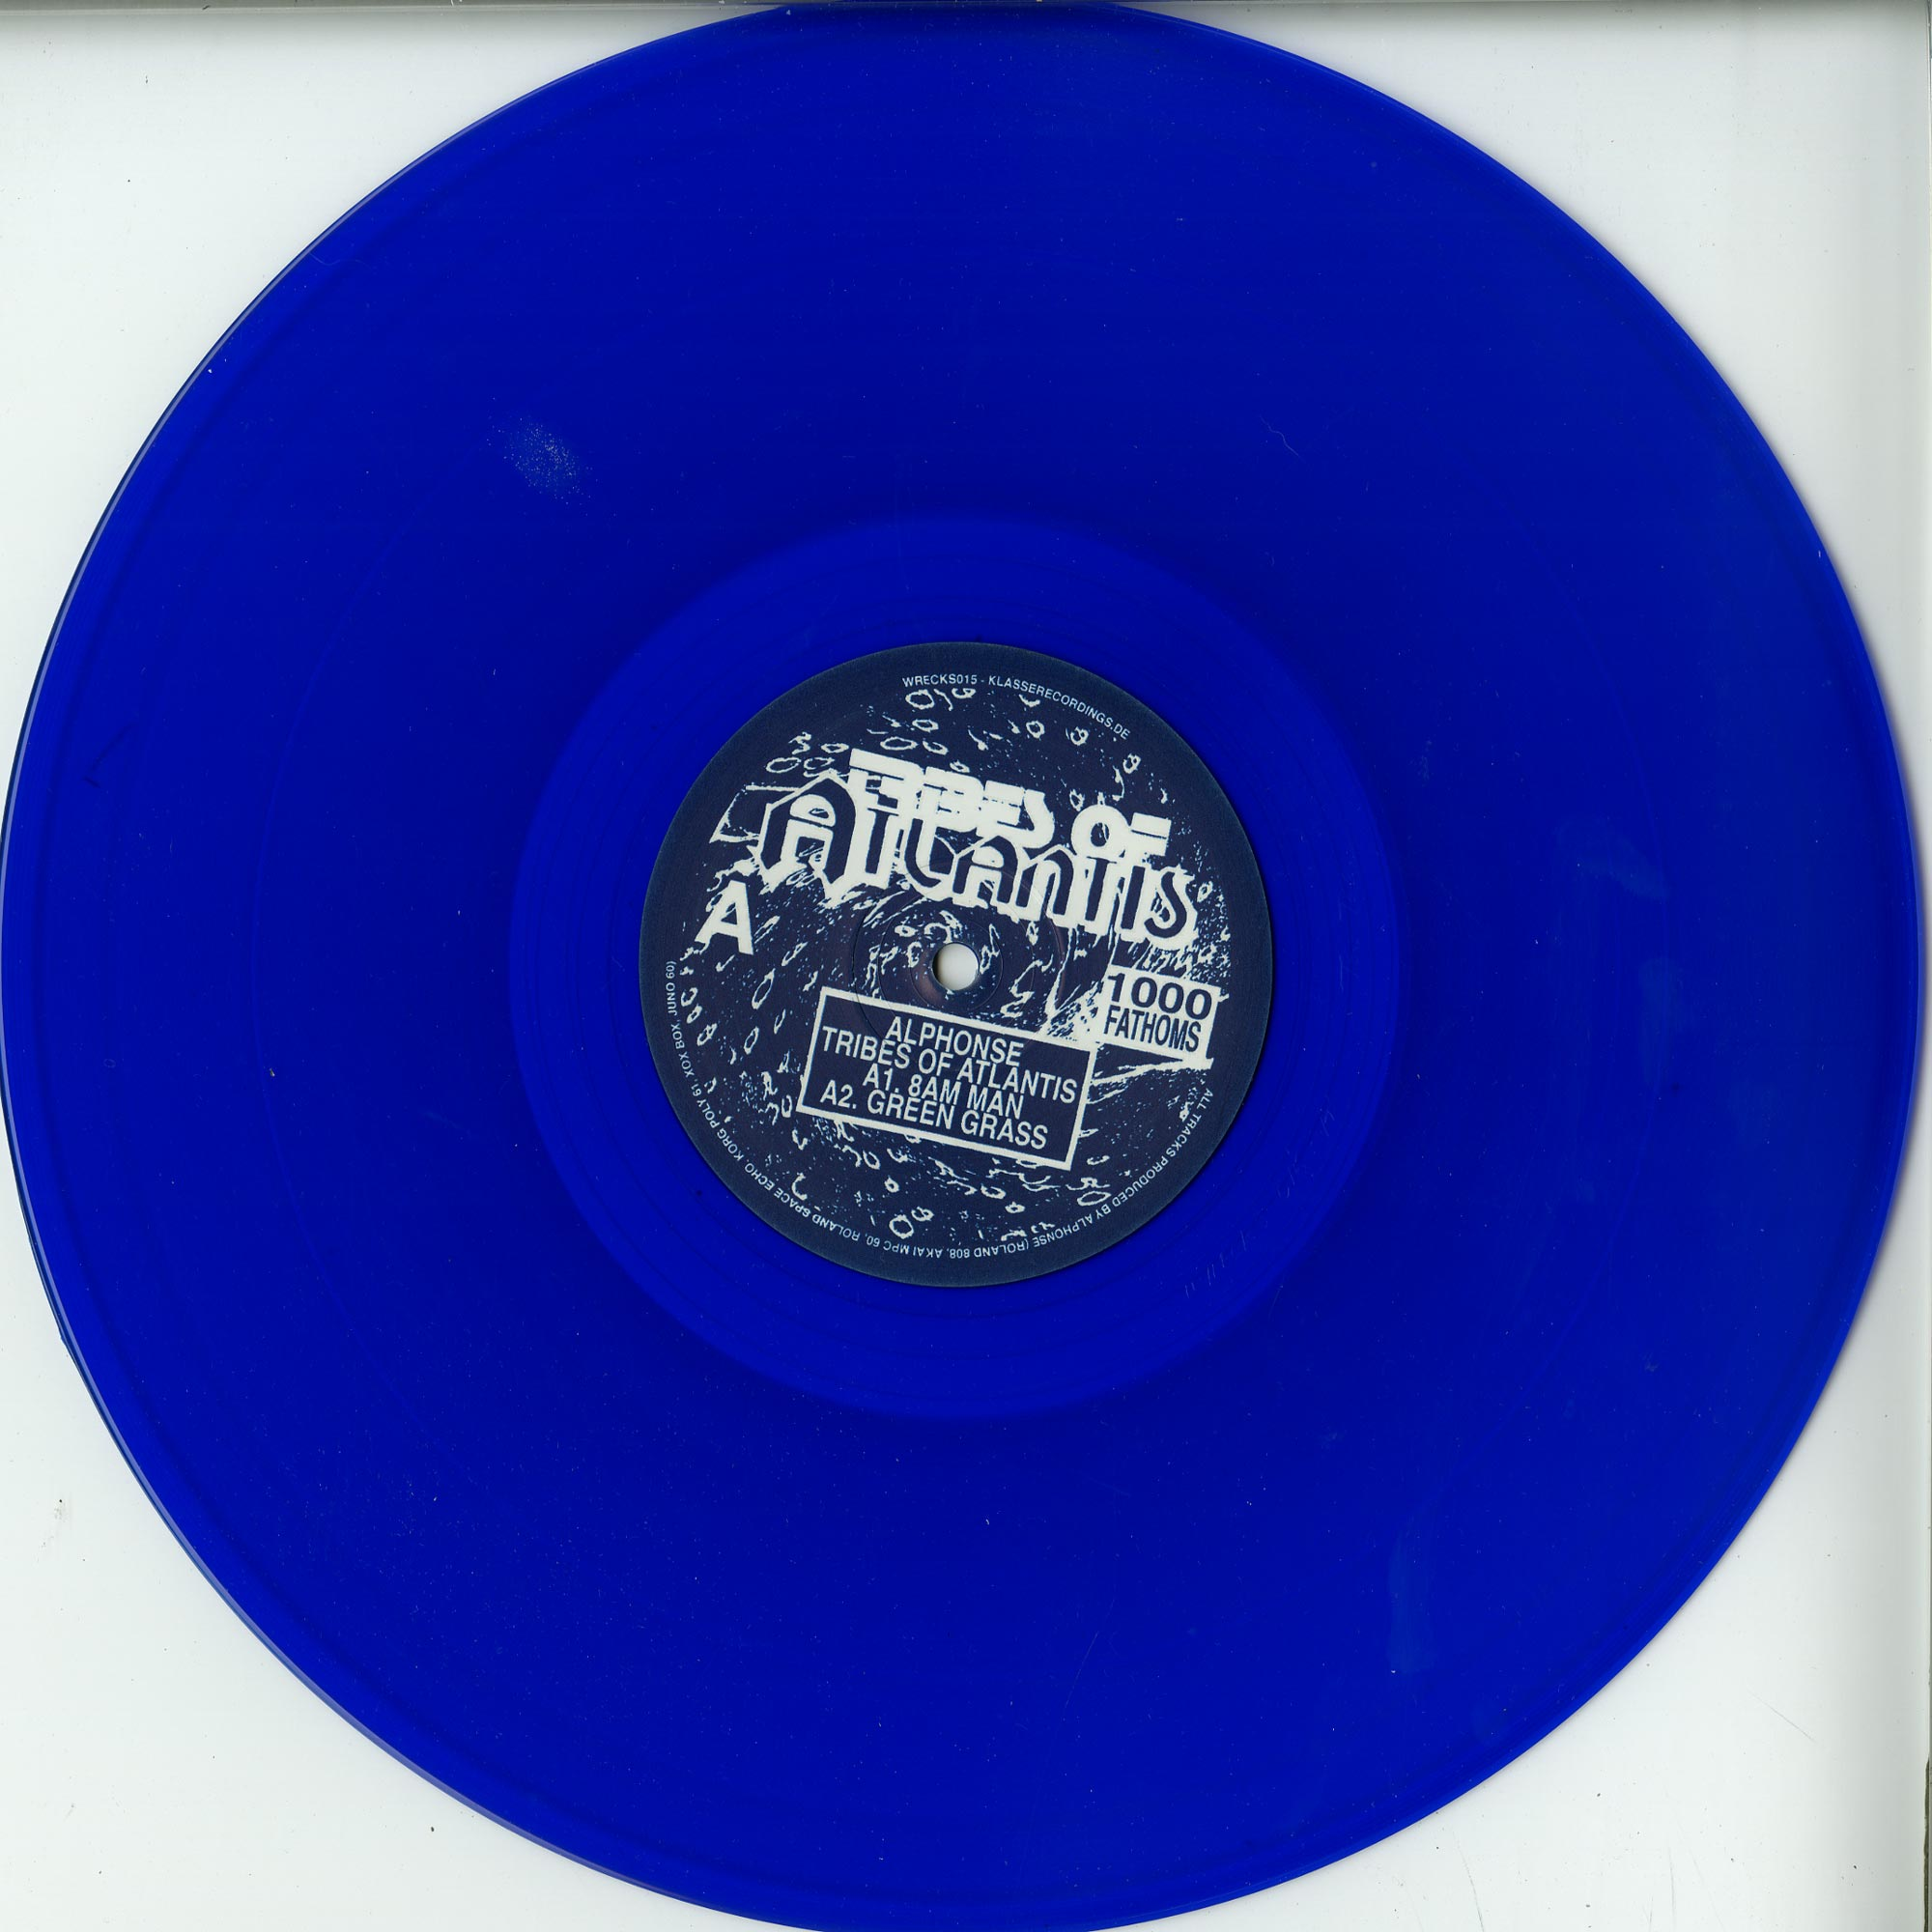 Alphonse - TRIBES OF ATLANTIS EP